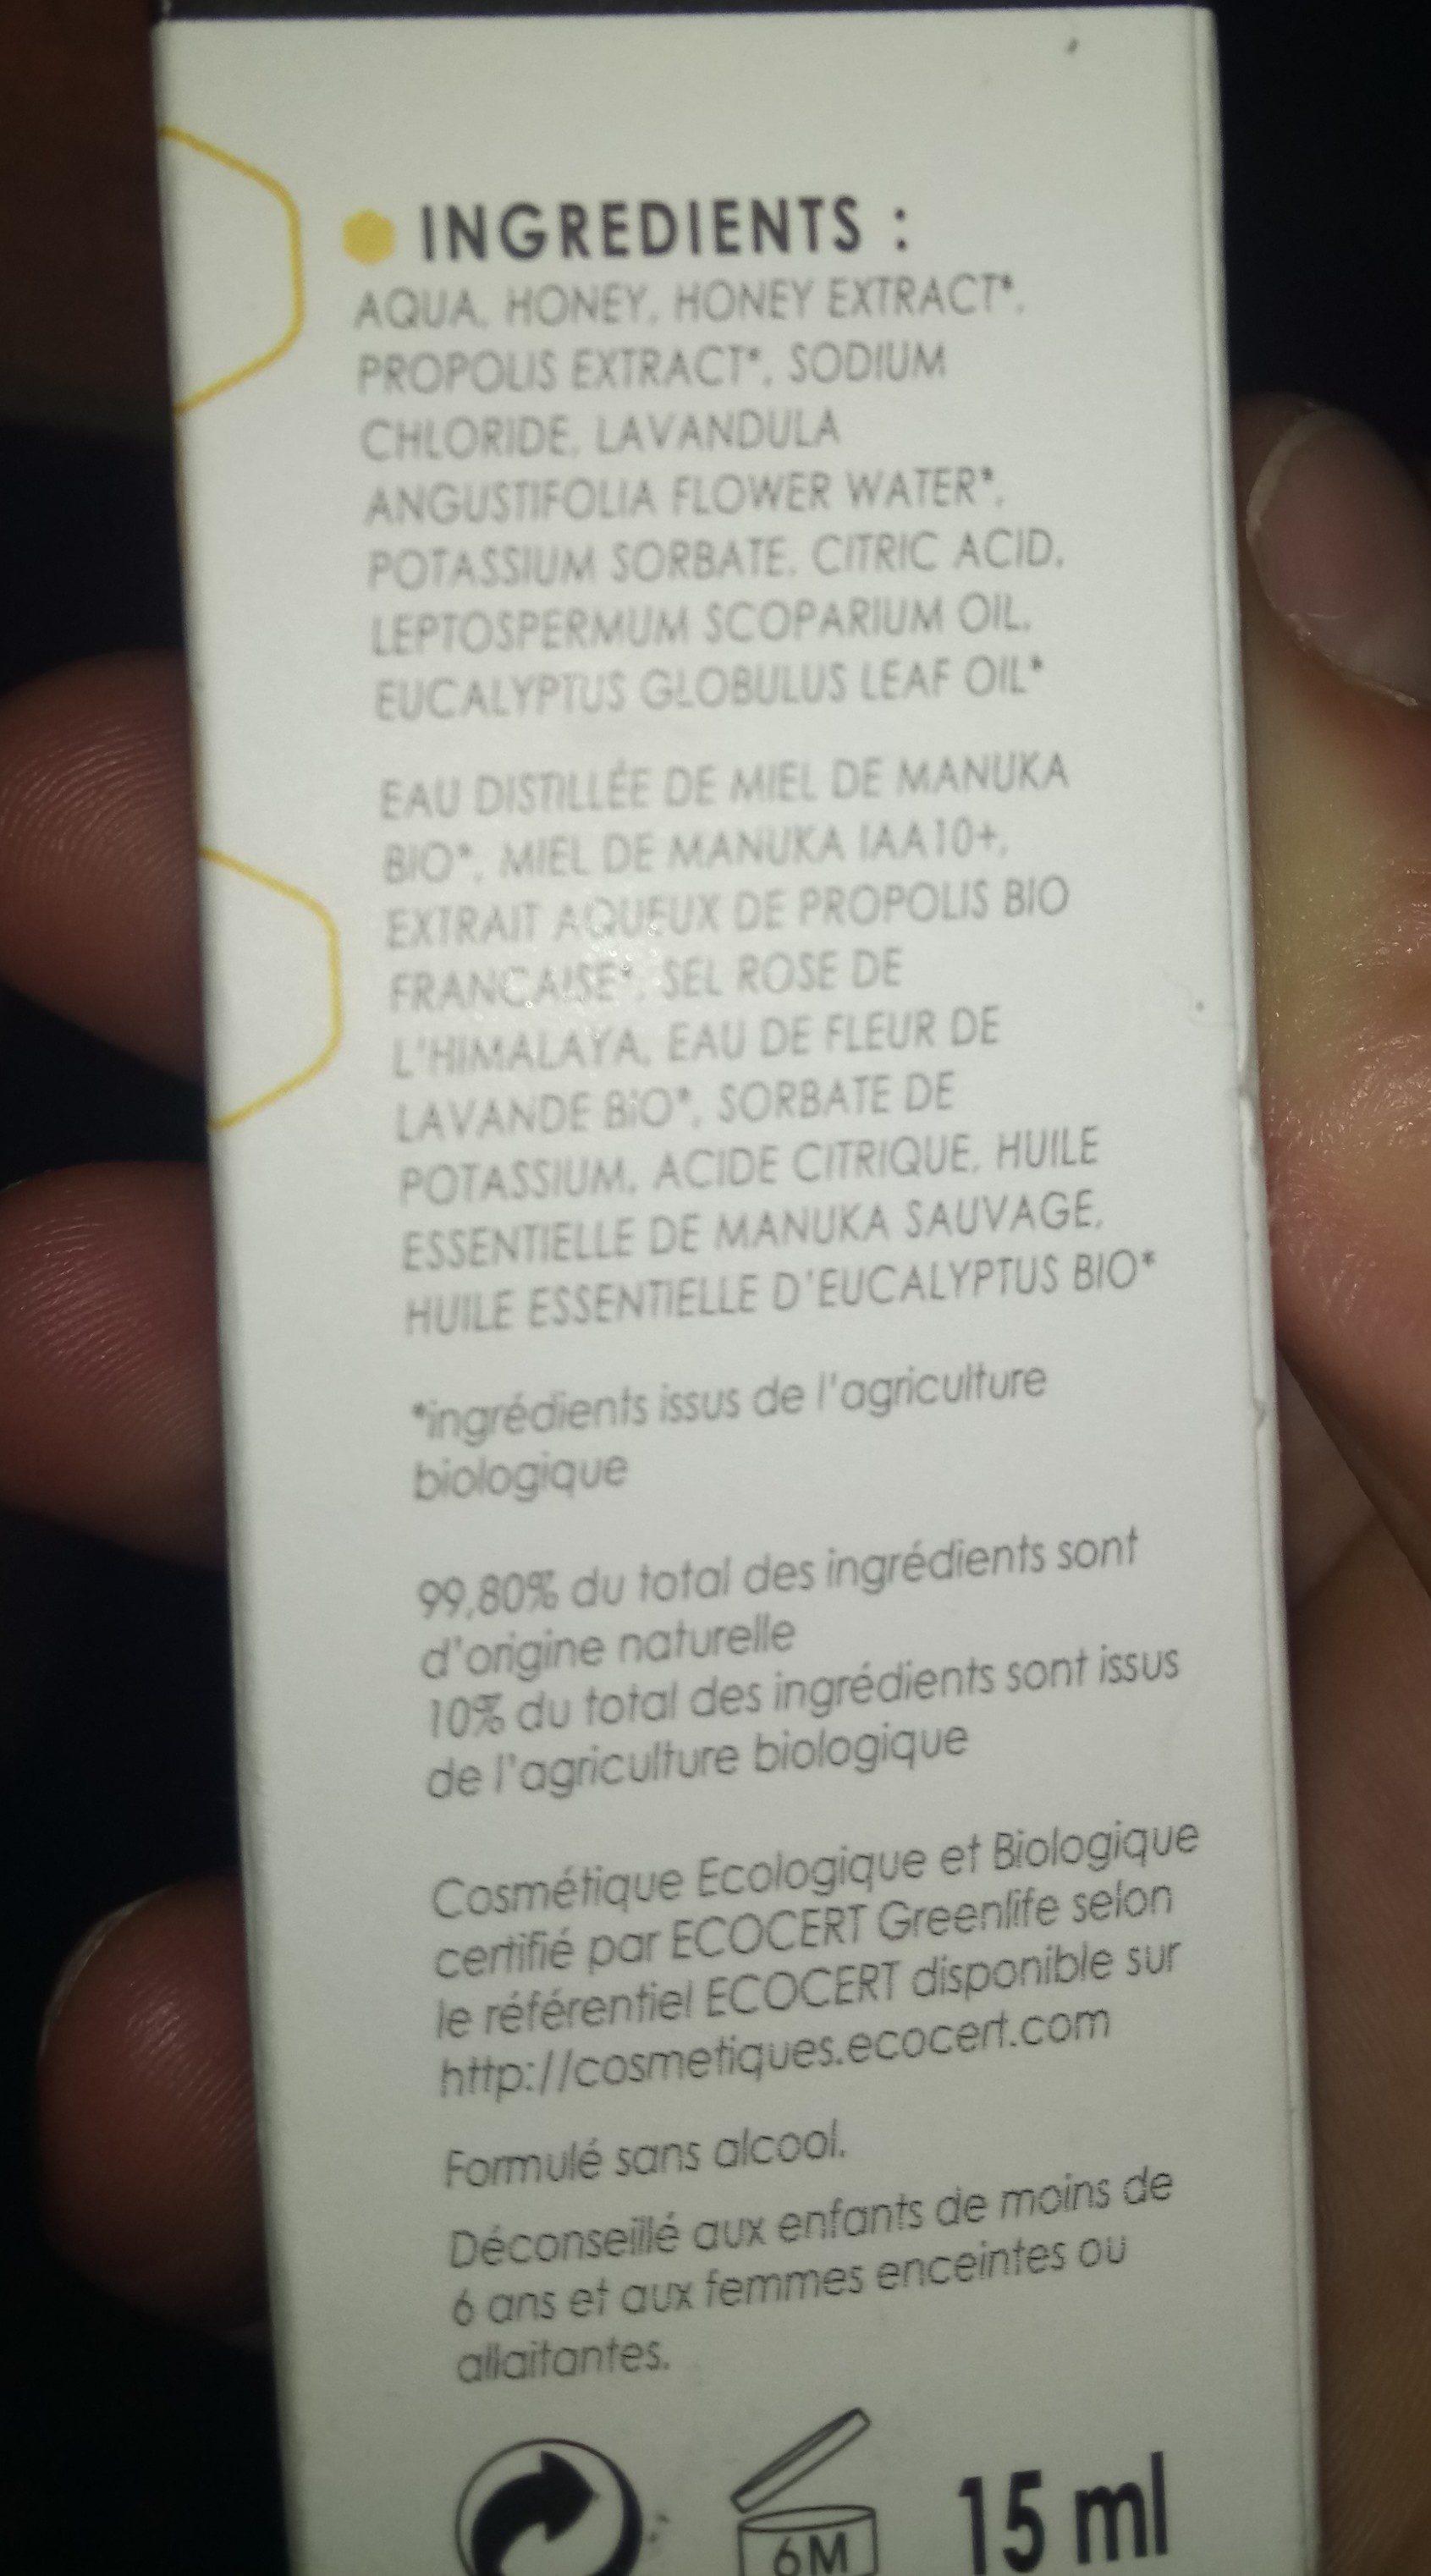 Spray Nez Et Sinus Miel De Manuka 10+, 15 ML - Comptoirs & Compagnies - Ingredients